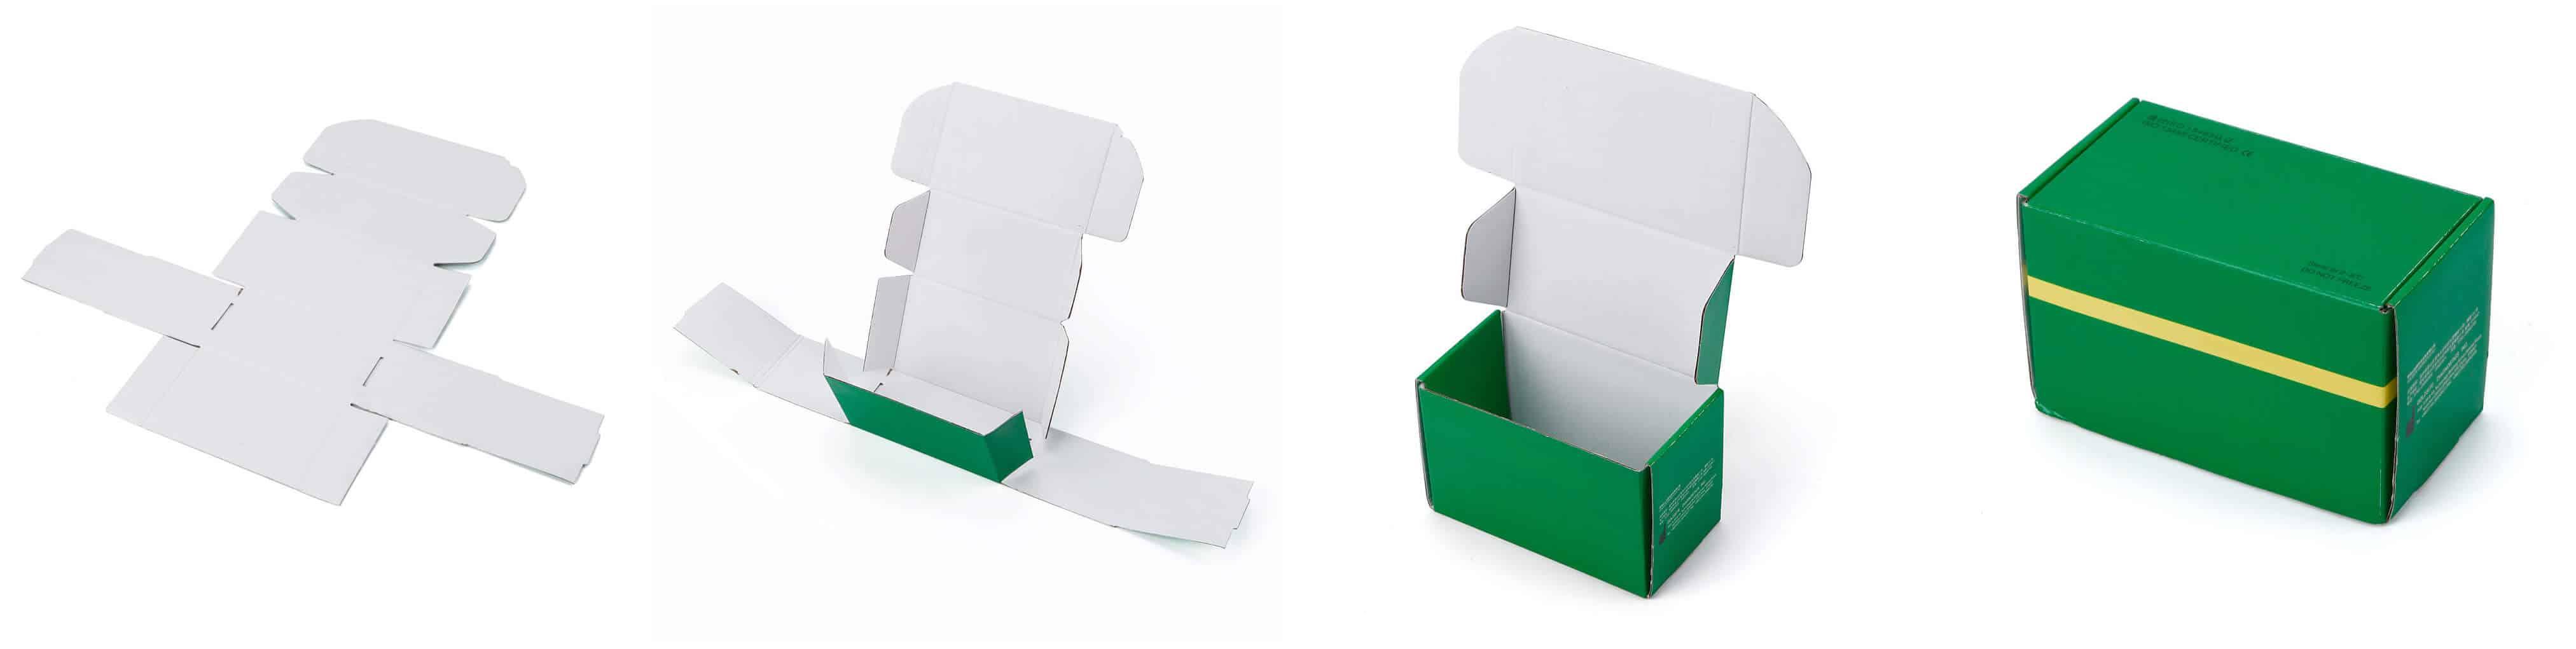 Custom-printed-Corrugated-Boxes-blog